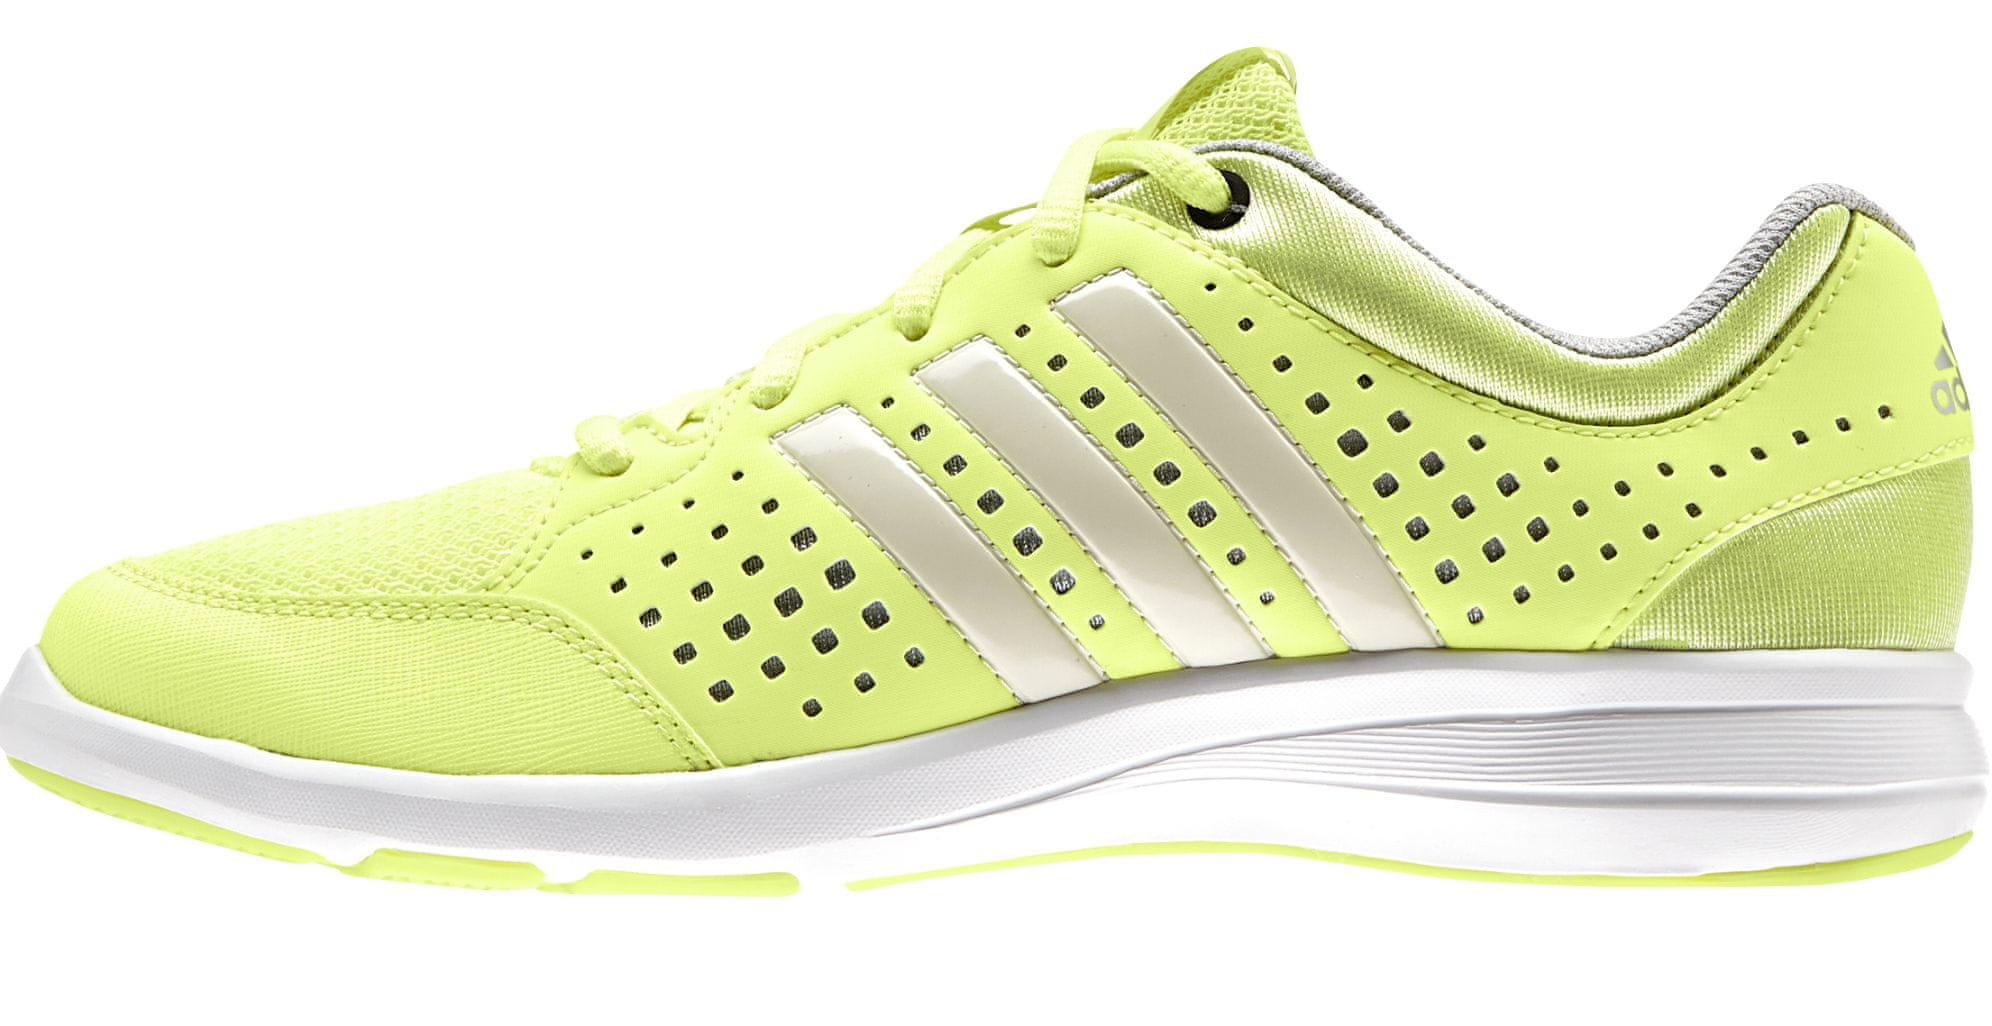 Adidas Arianna III Frozen Yellow F15/Chalk White/Silver Met. 8,0 (42,0)